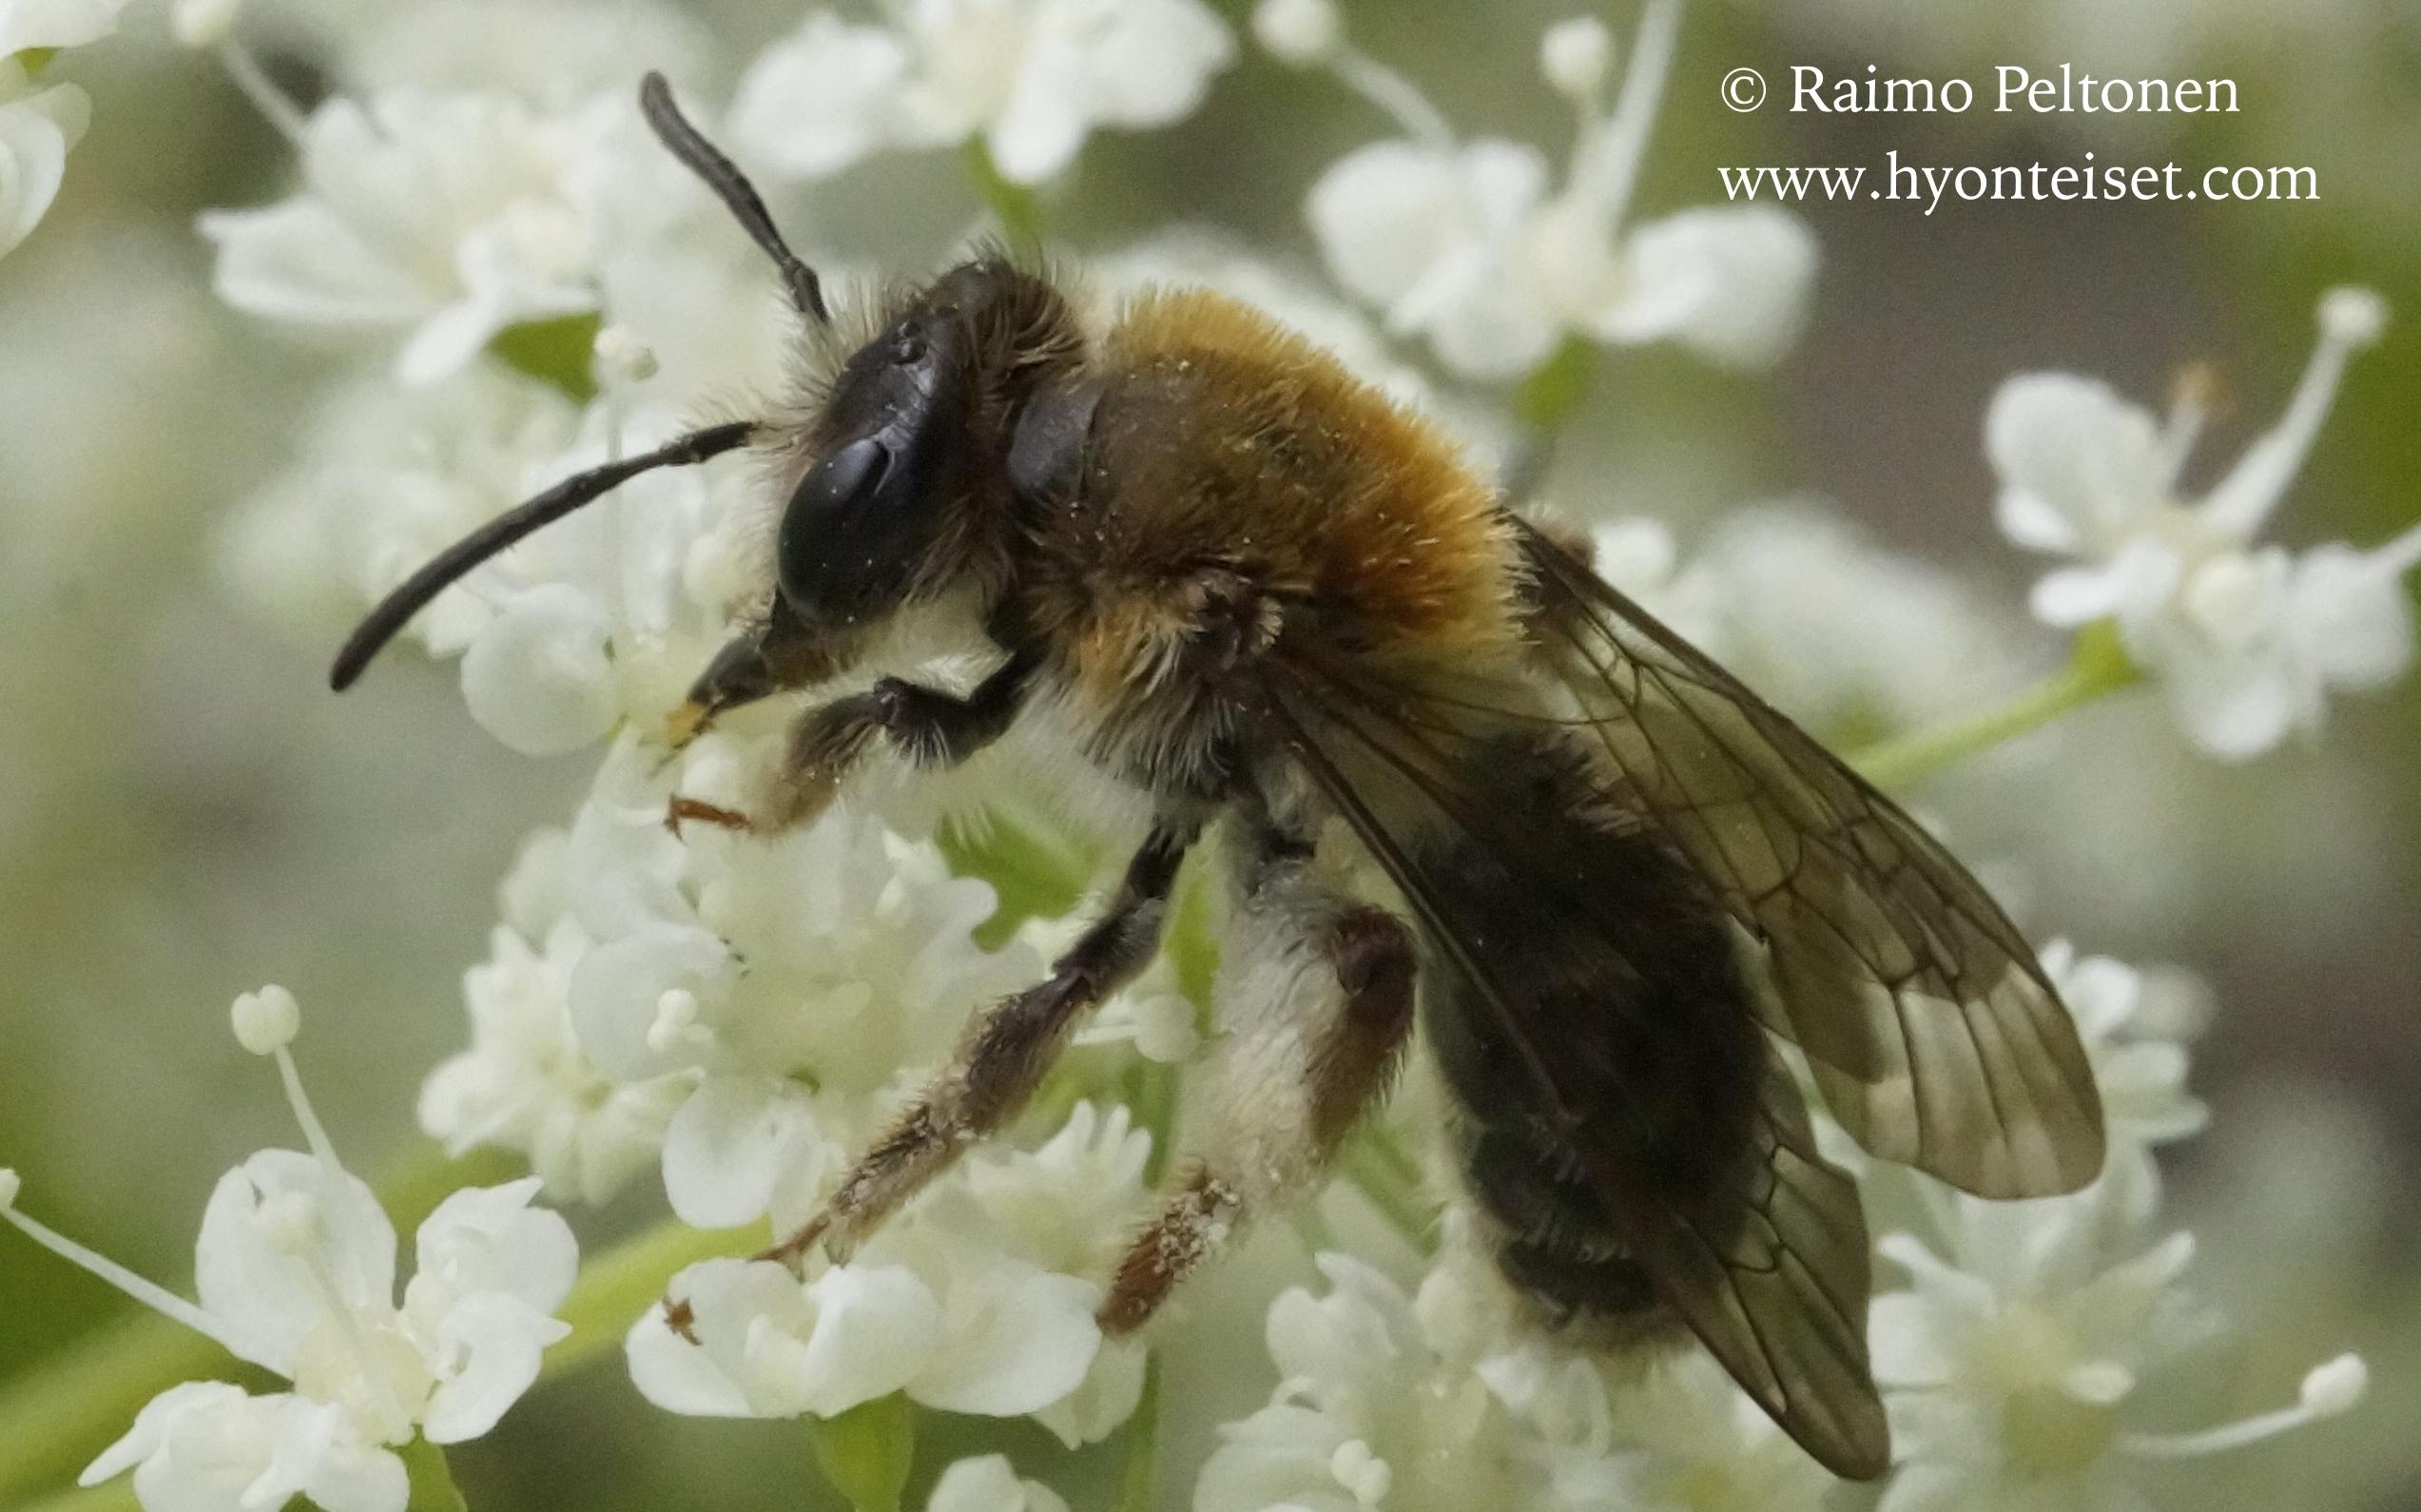 Andrena cf. fucata-punamaamehiläinen (det. Juho Paukkunen)